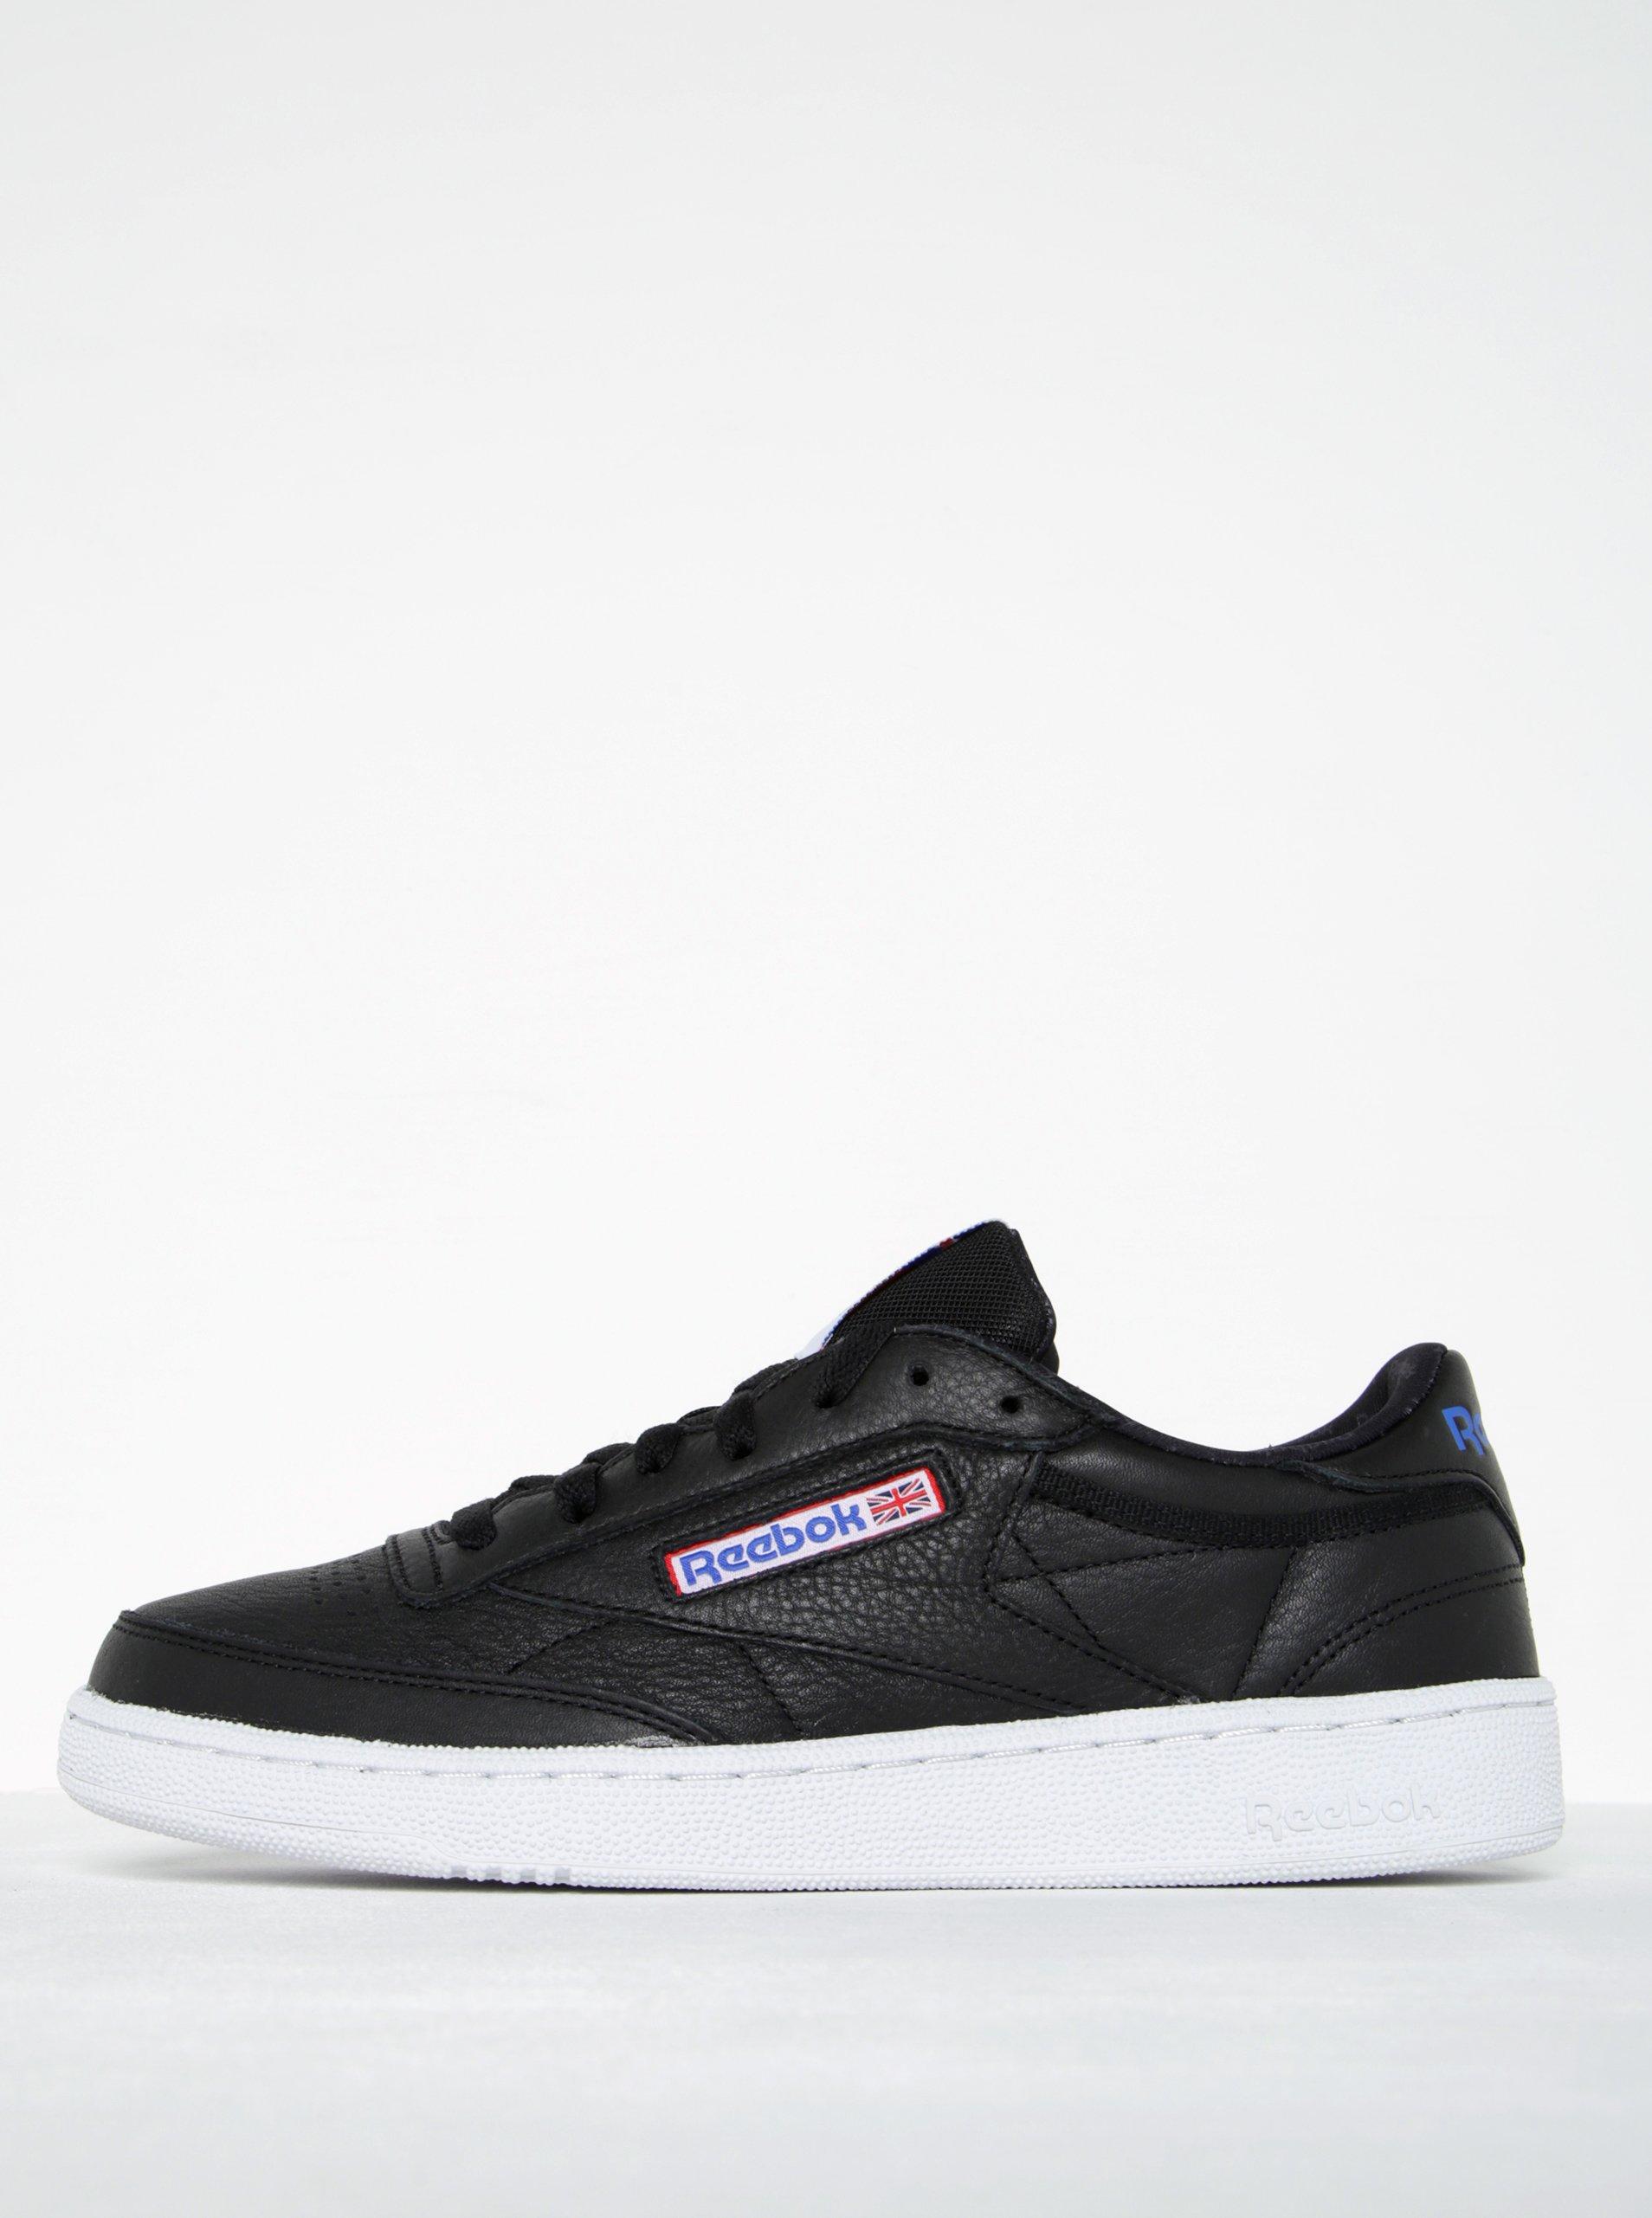 Černé pánské kožené tenisky Reebok